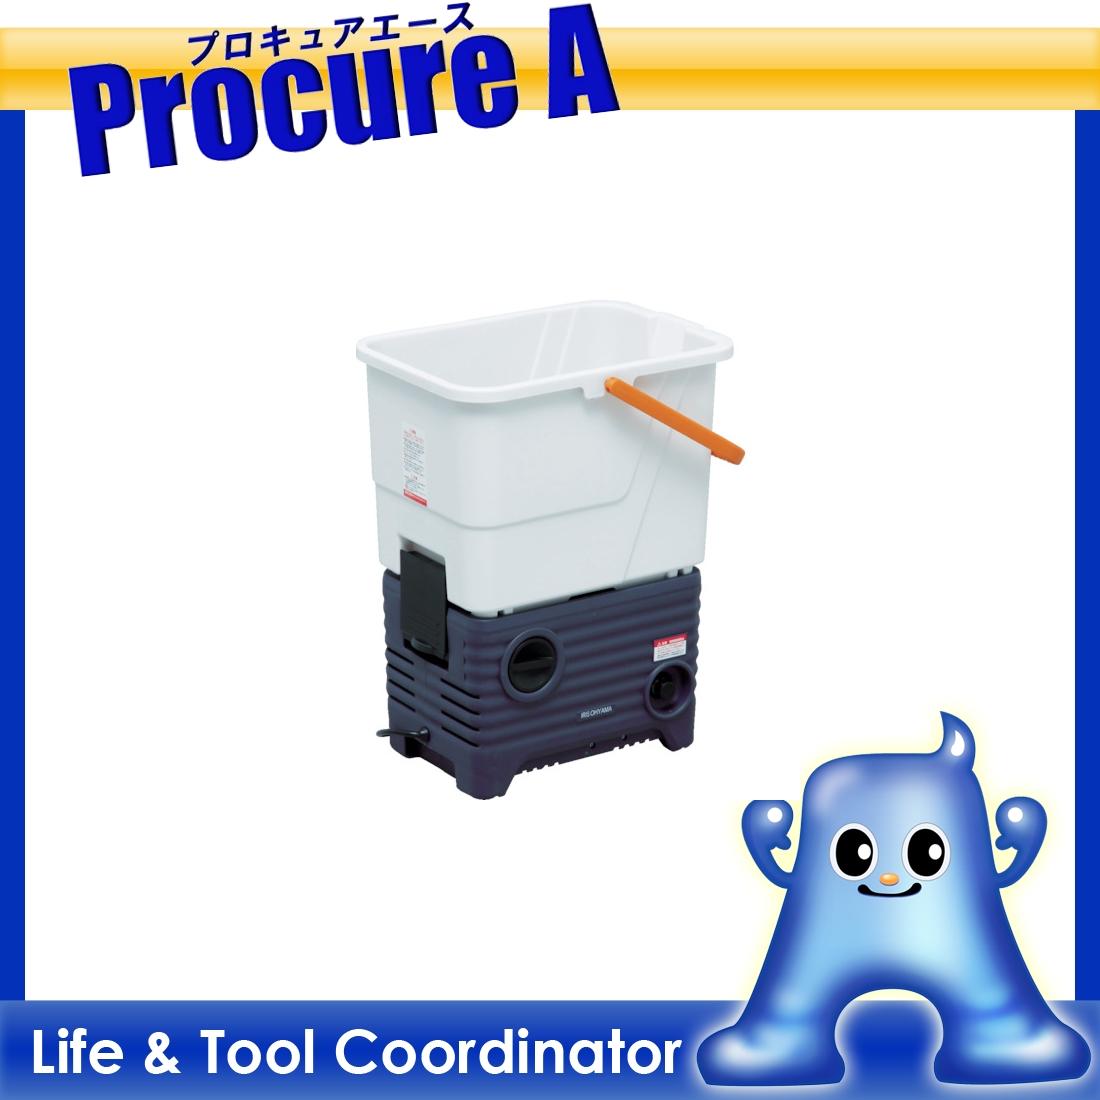 IRIS タンク式高圧洗浄機 SBT-512 SBT-512 ▼471-6523 アイリスオーヤマ(株)